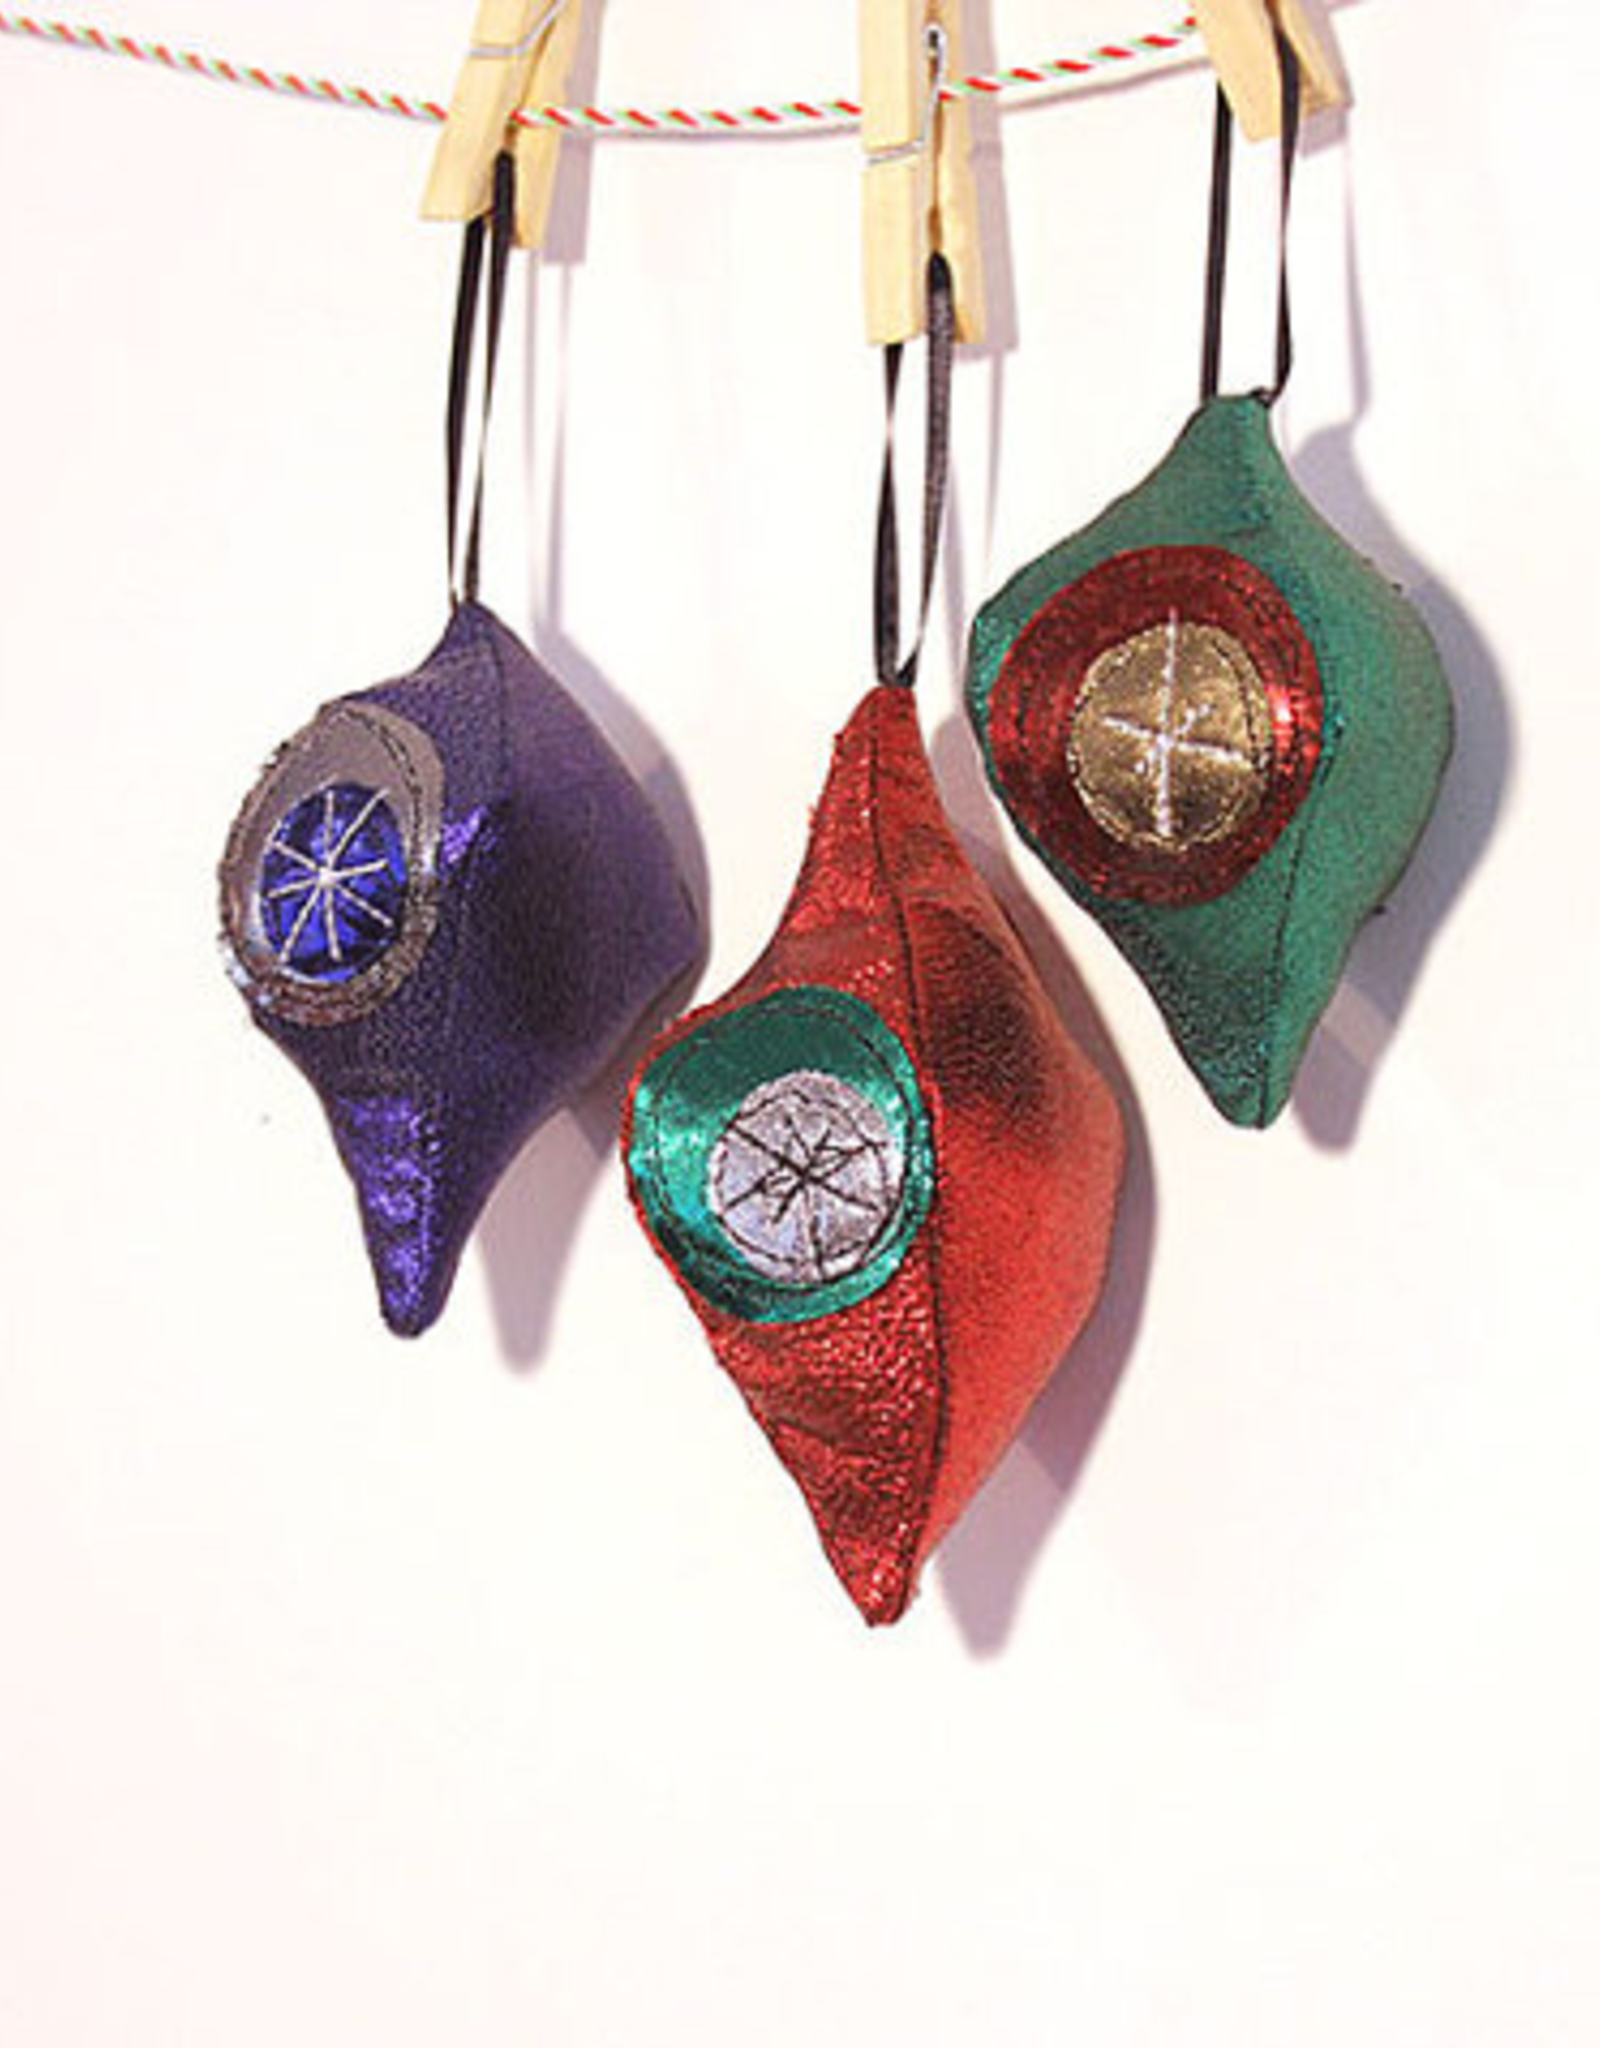 Creationz By Catherine Creationz By Catherine Retro Bulb Ornament-Single